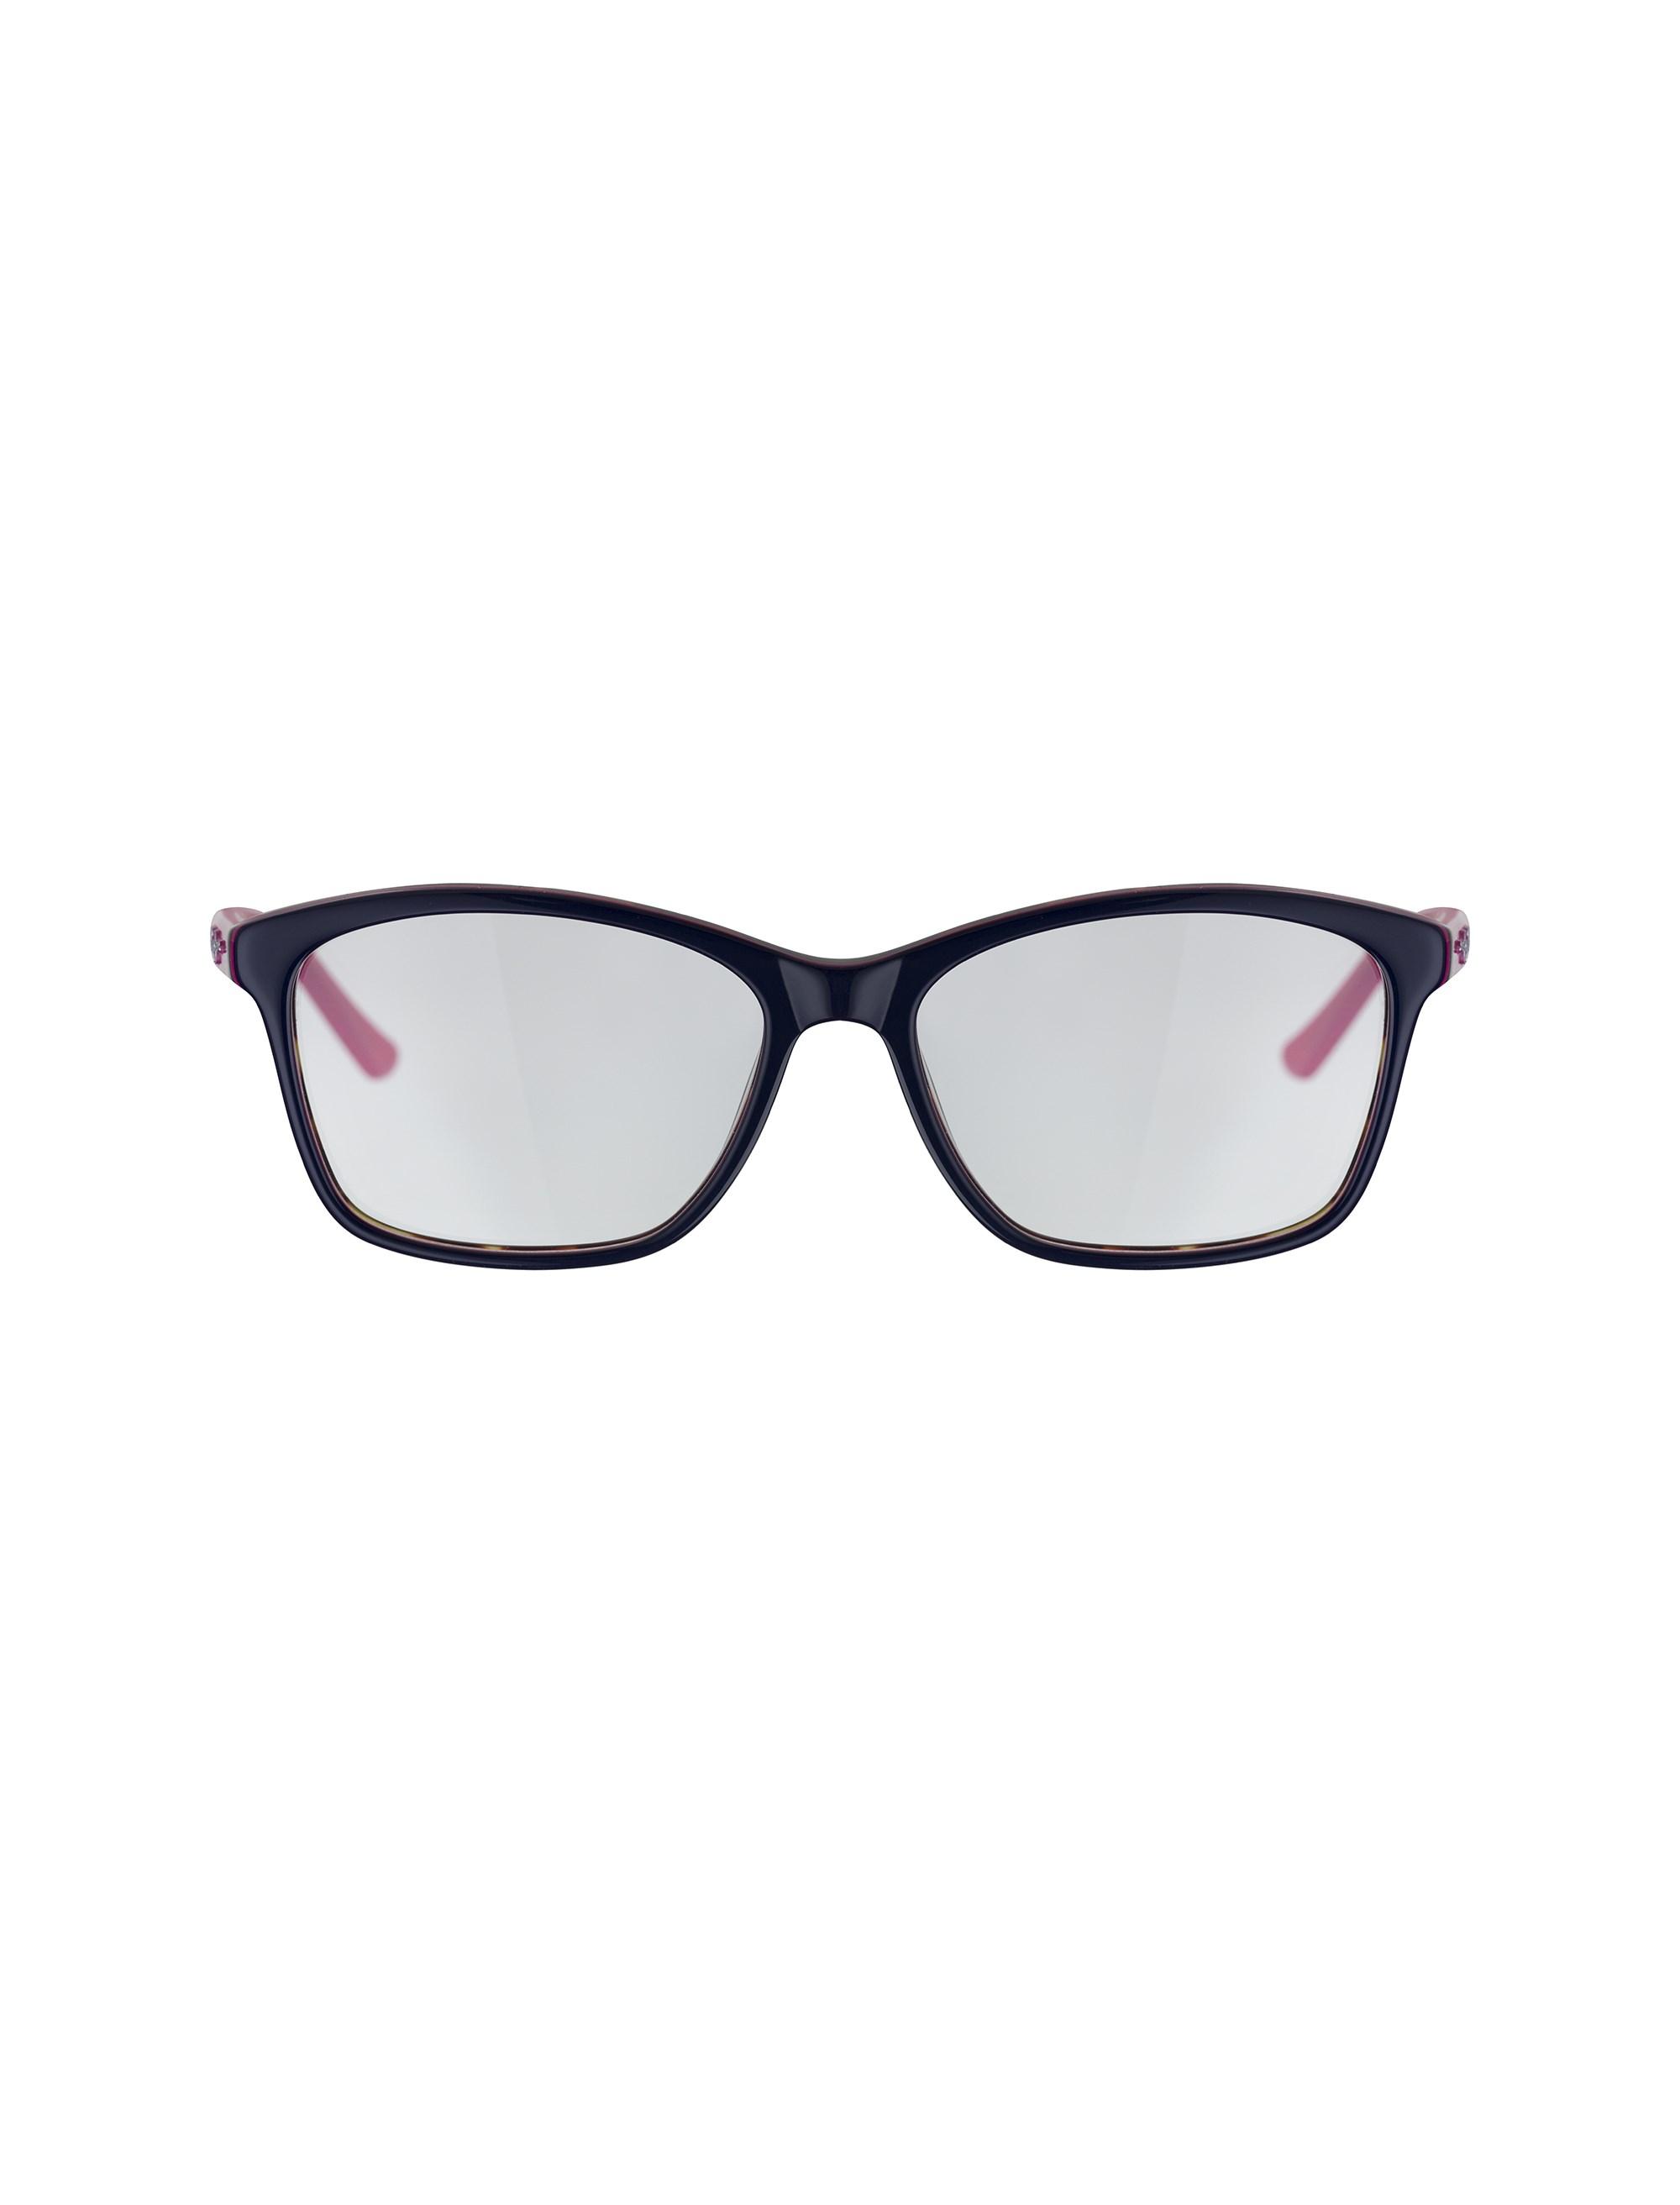 عینک طبی ویفرر زنانه - پپه جینز - بنفش - 1